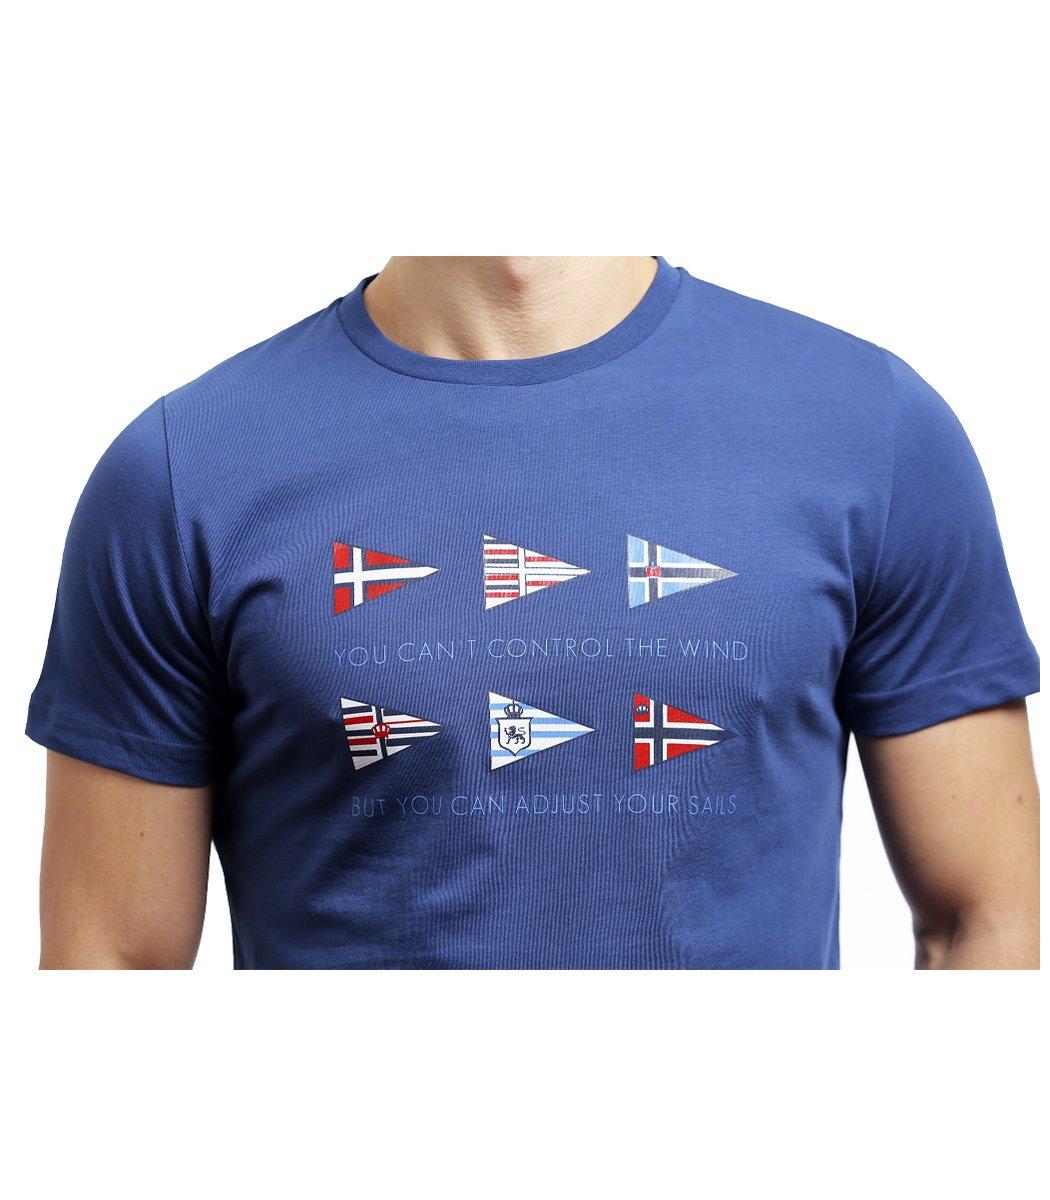 Синяя футболка Paul&Shark с принтом - Синий - Вид 5